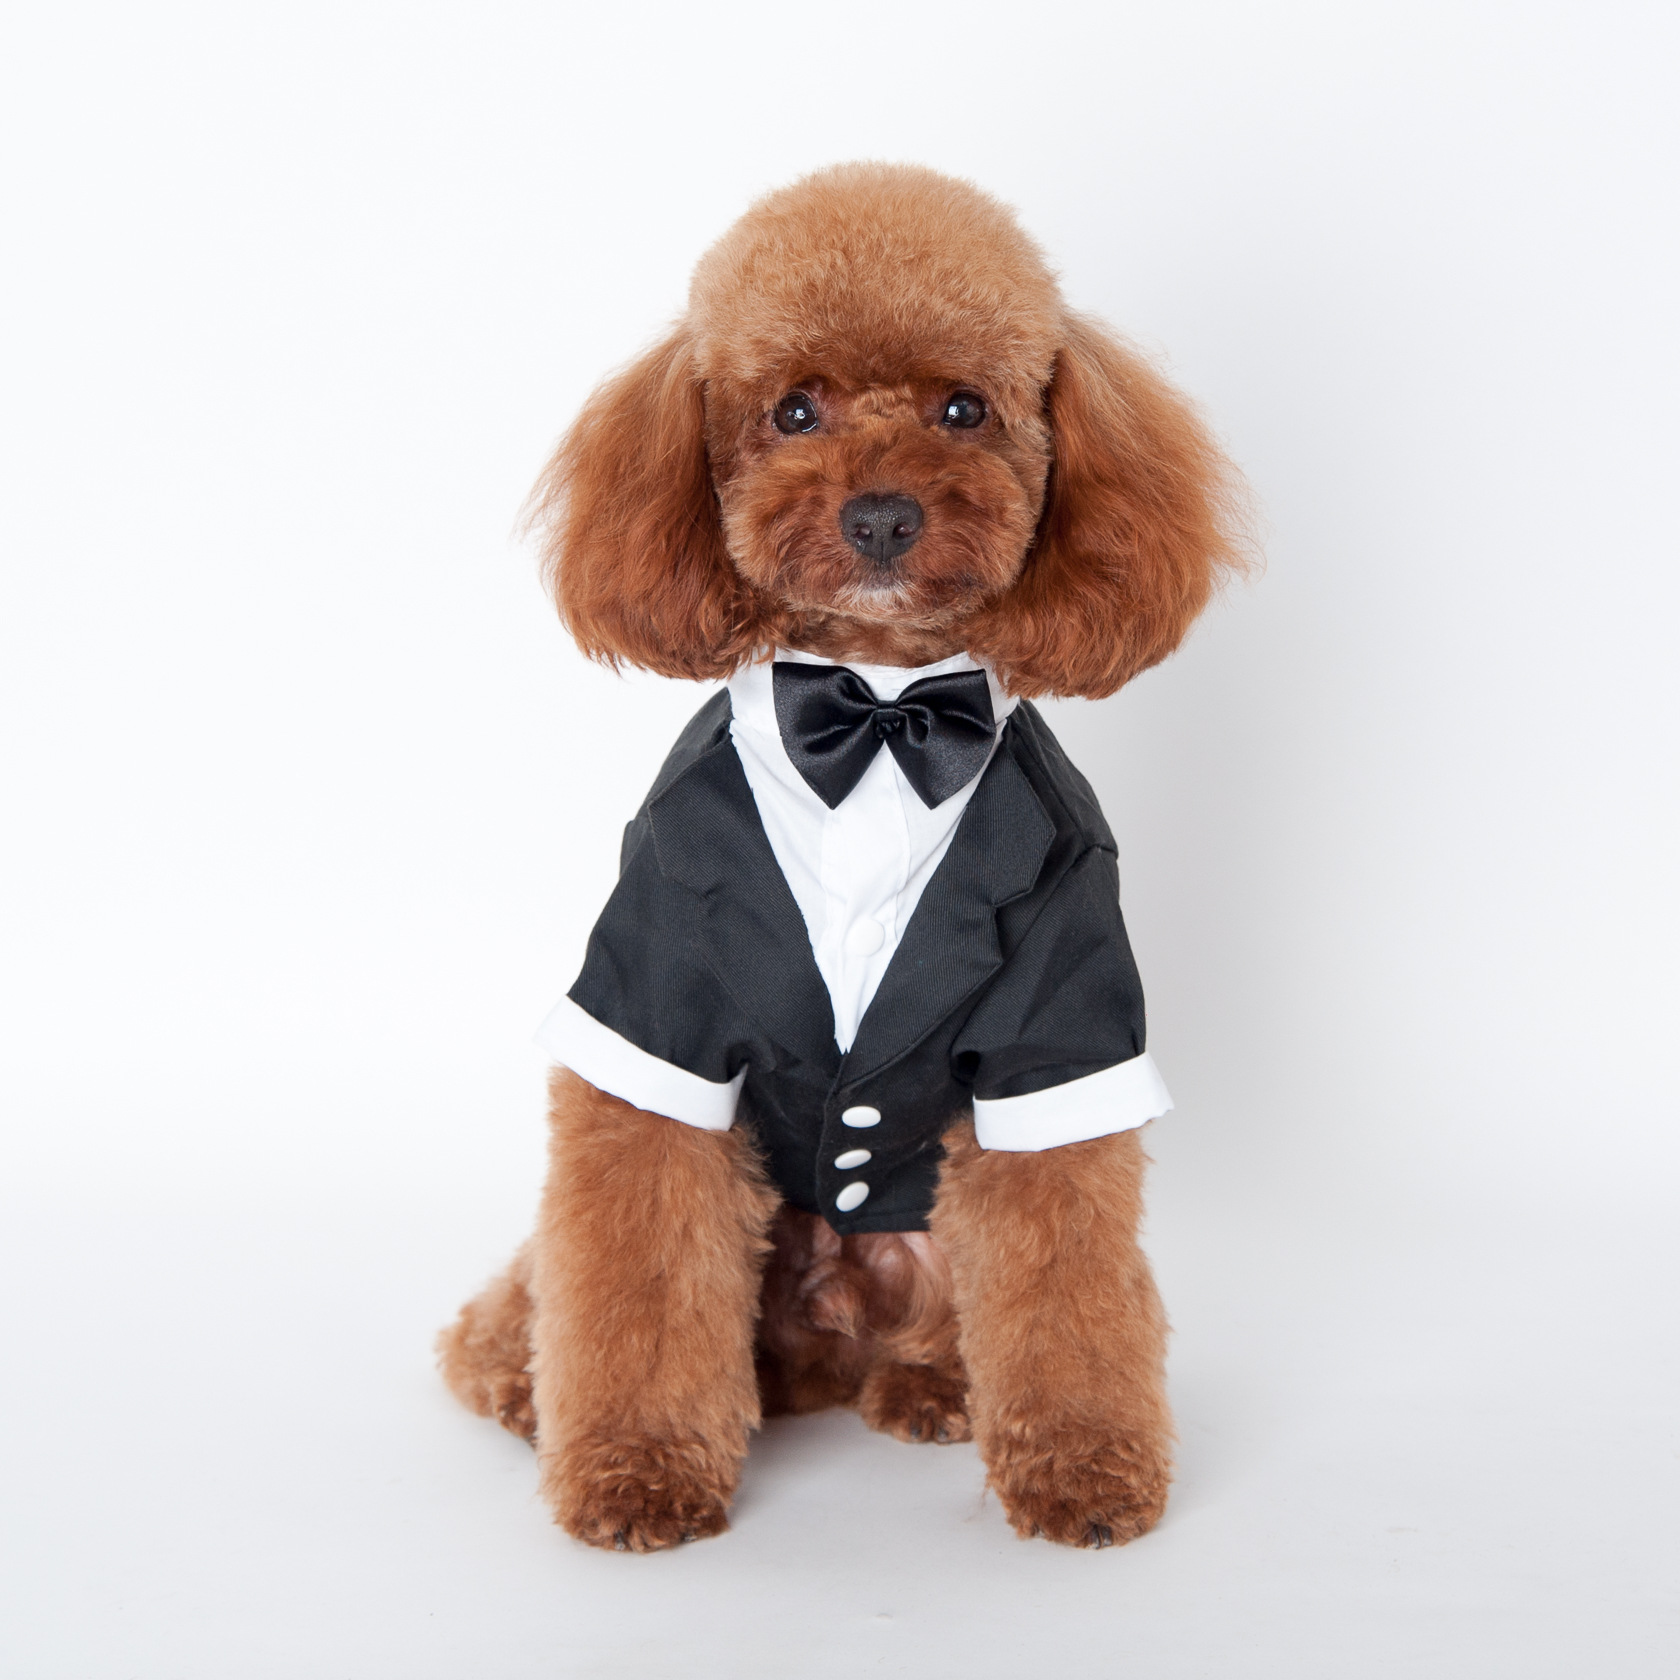 New Pet Dog Puppy Clothes Cat Tuxedo Bow Tie Wedding Suit Costumes Coat S-XXL